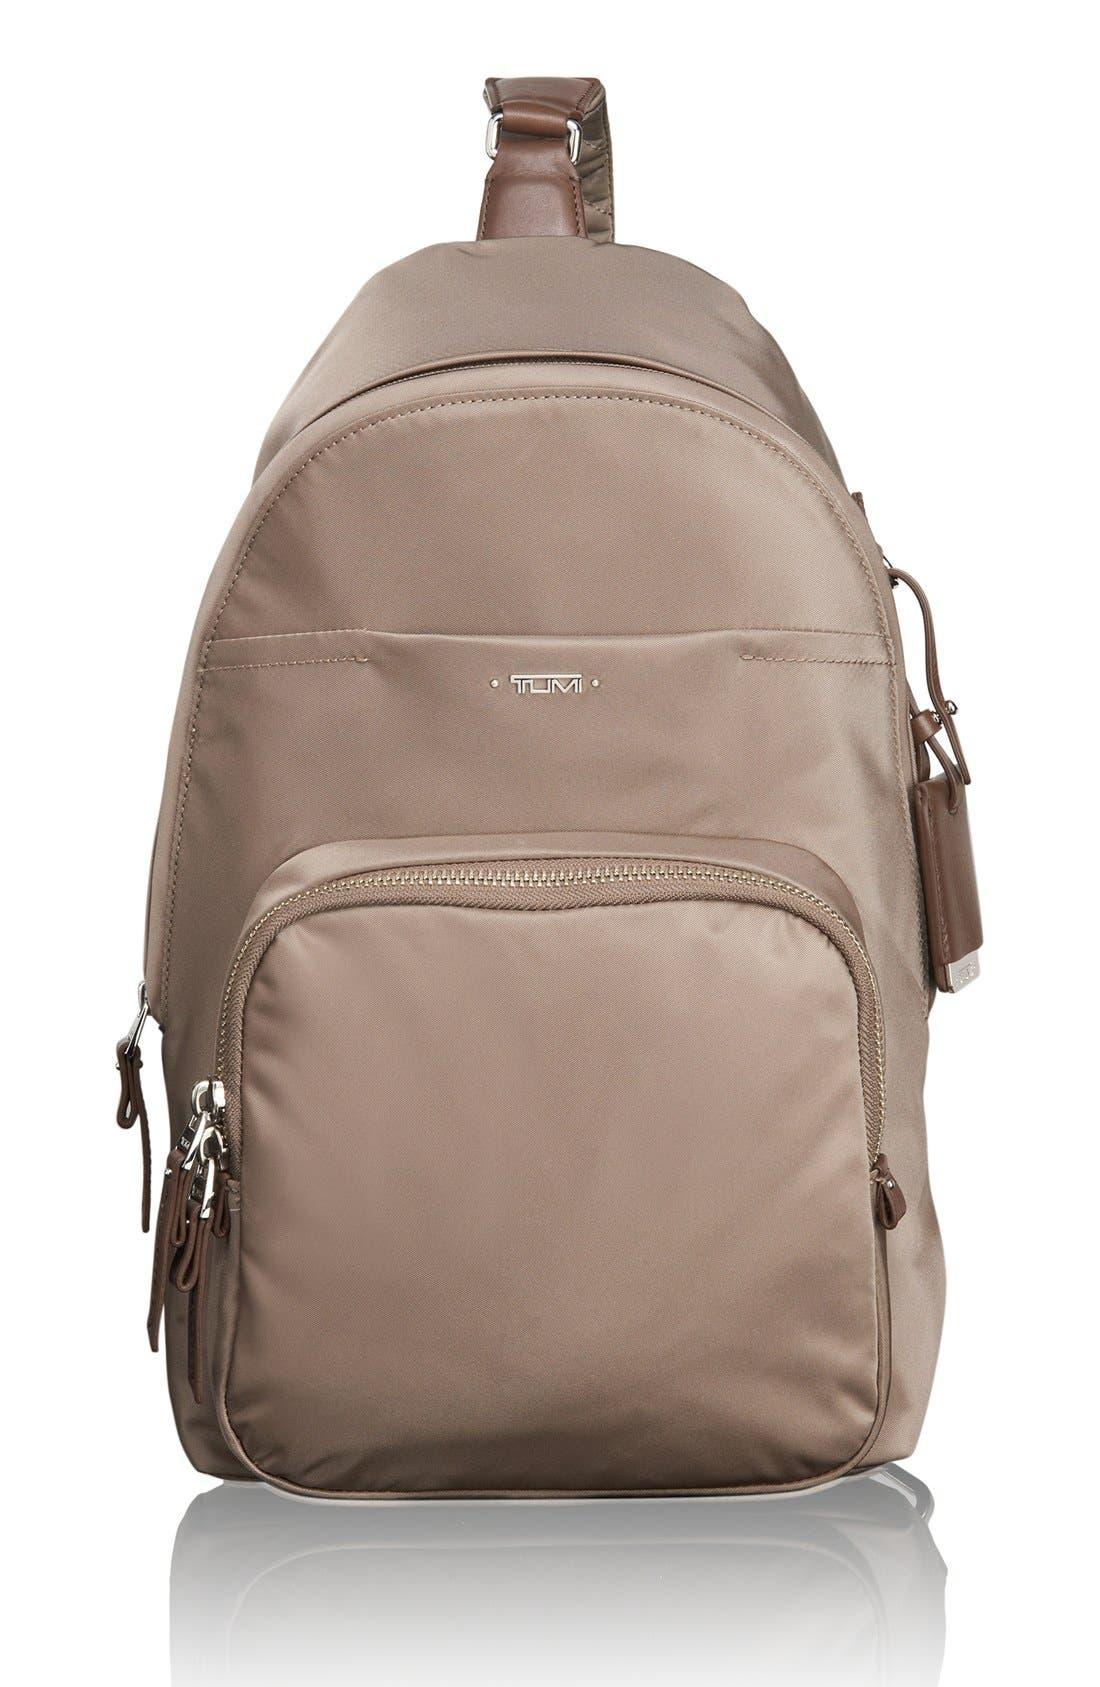 Alternate Image 1 Selected - Tumi 'Brive' Sling Backpack